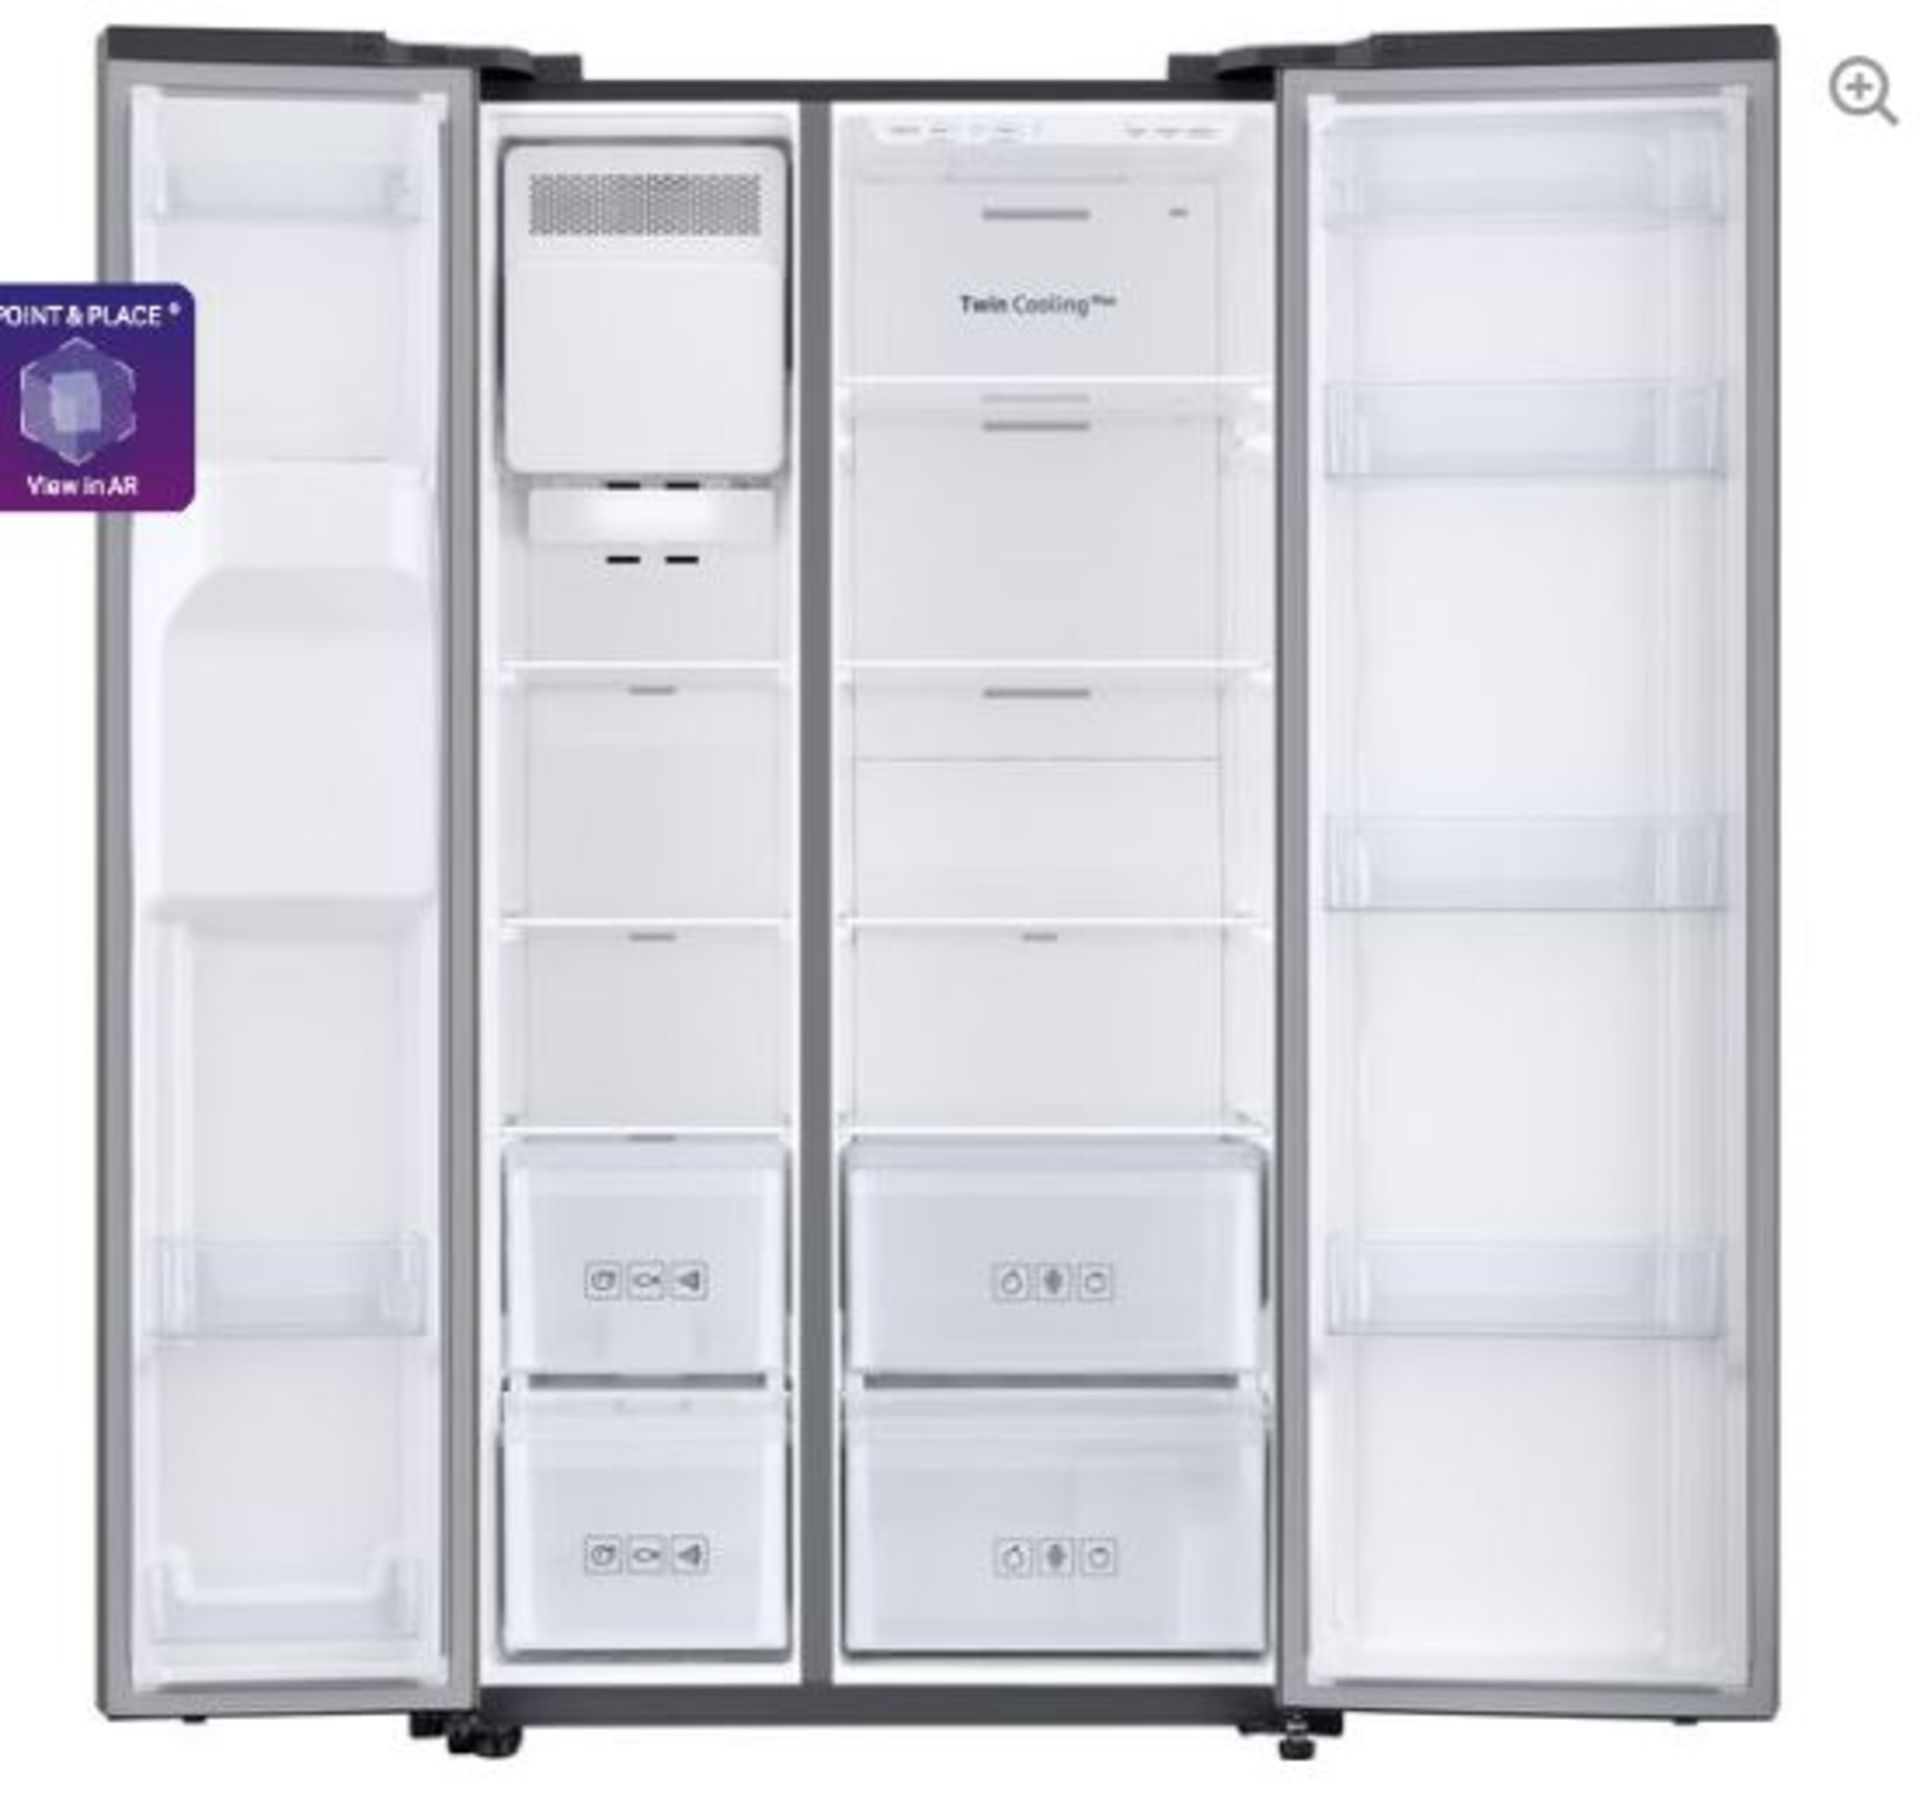 Pallet of 1 Samsung Water & Ice Fridge freezer. Latest selling price £1,299.99* - Image 2 of 8